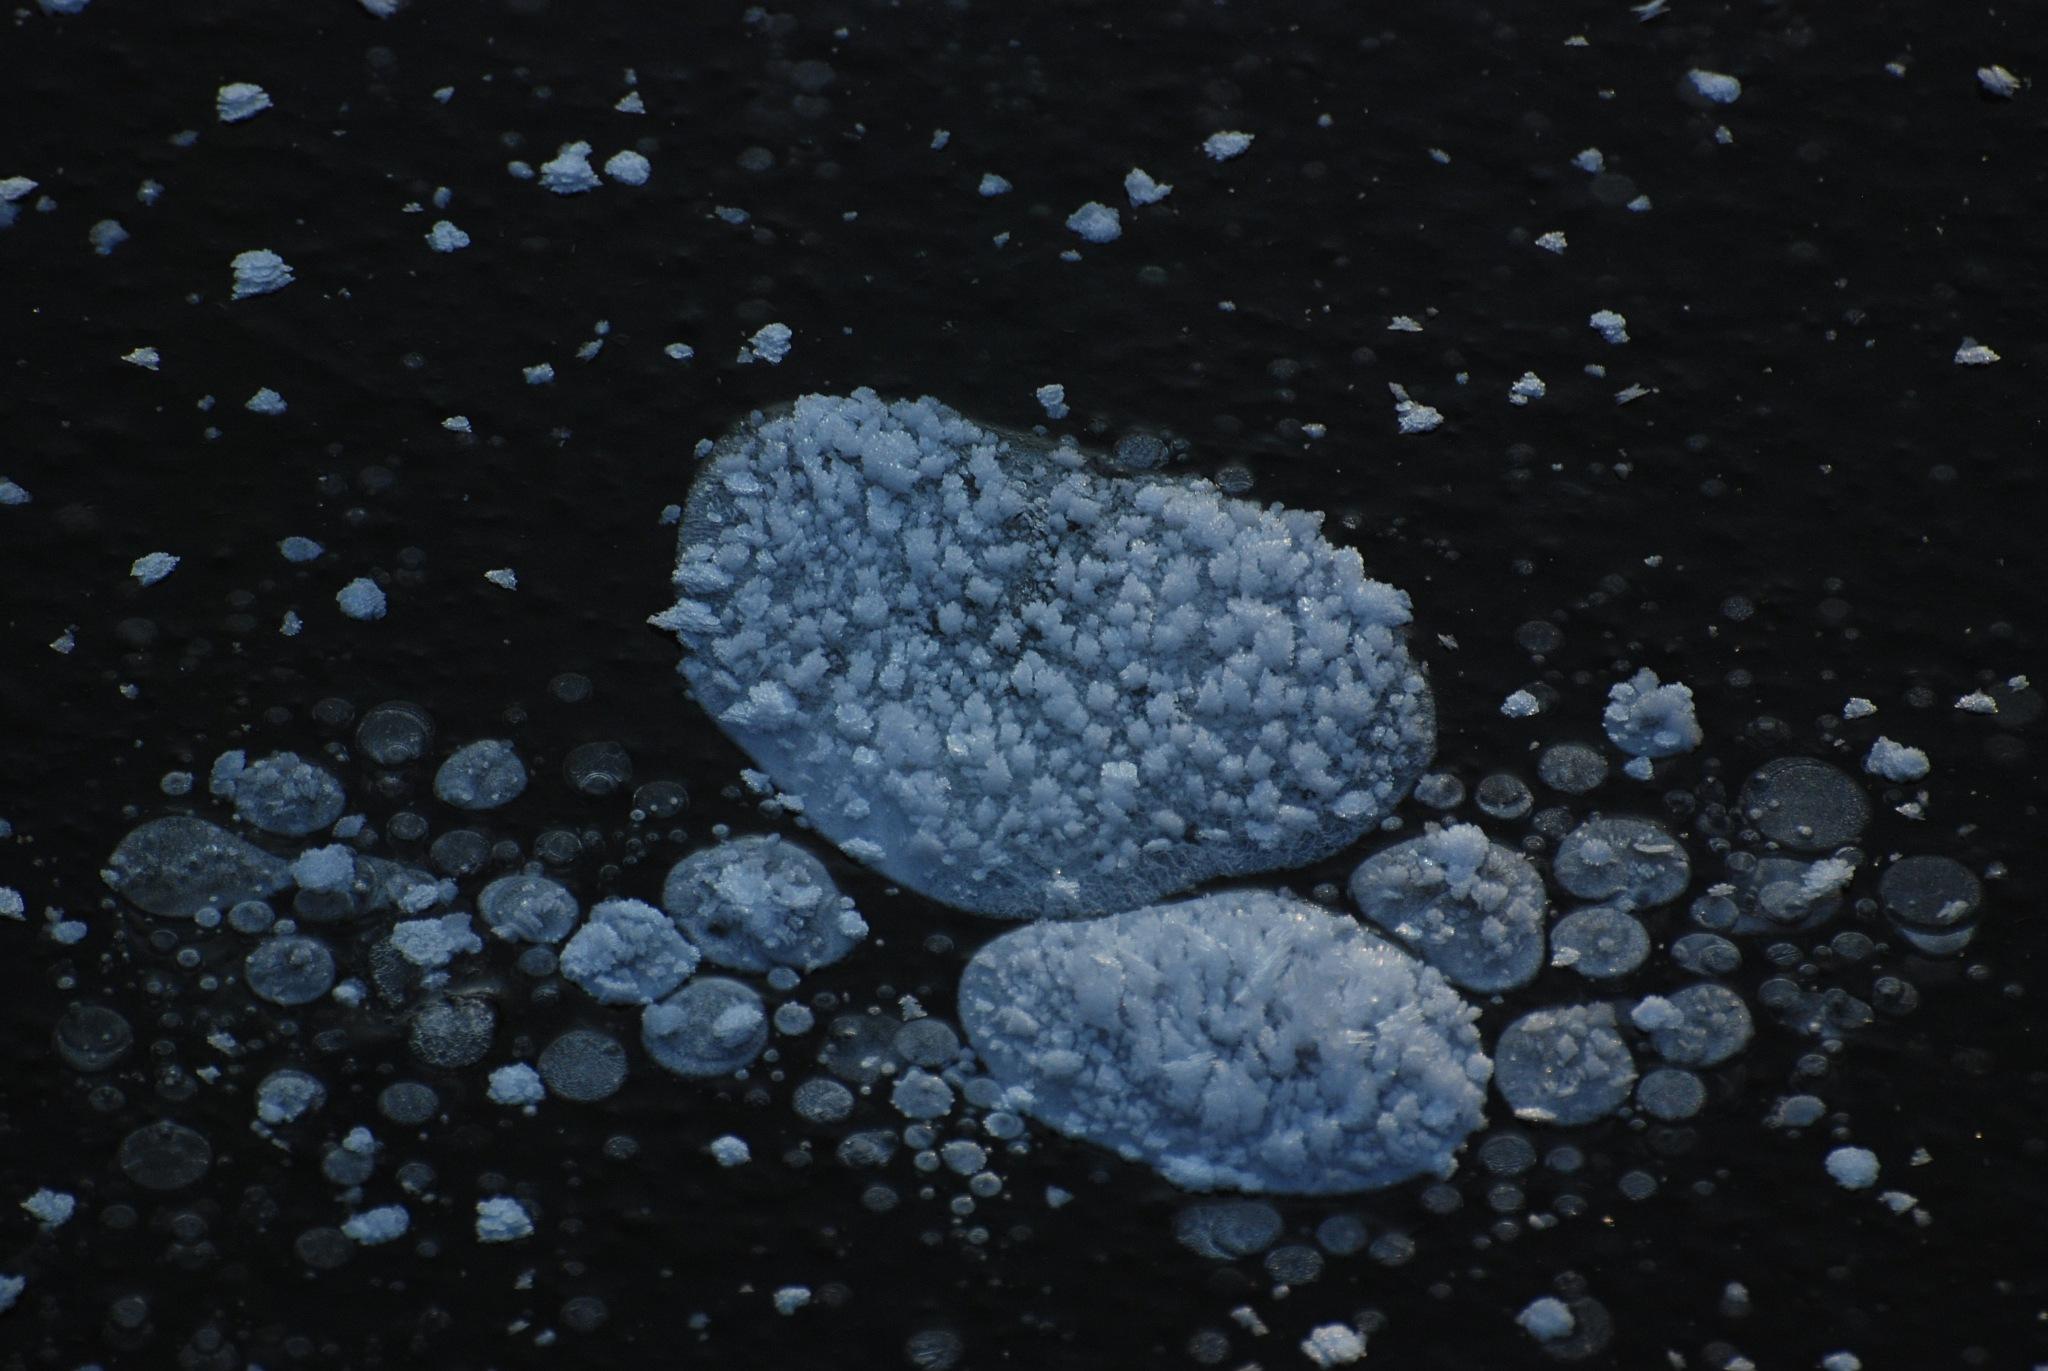 bevroren luchtbellen by ilseBodewes